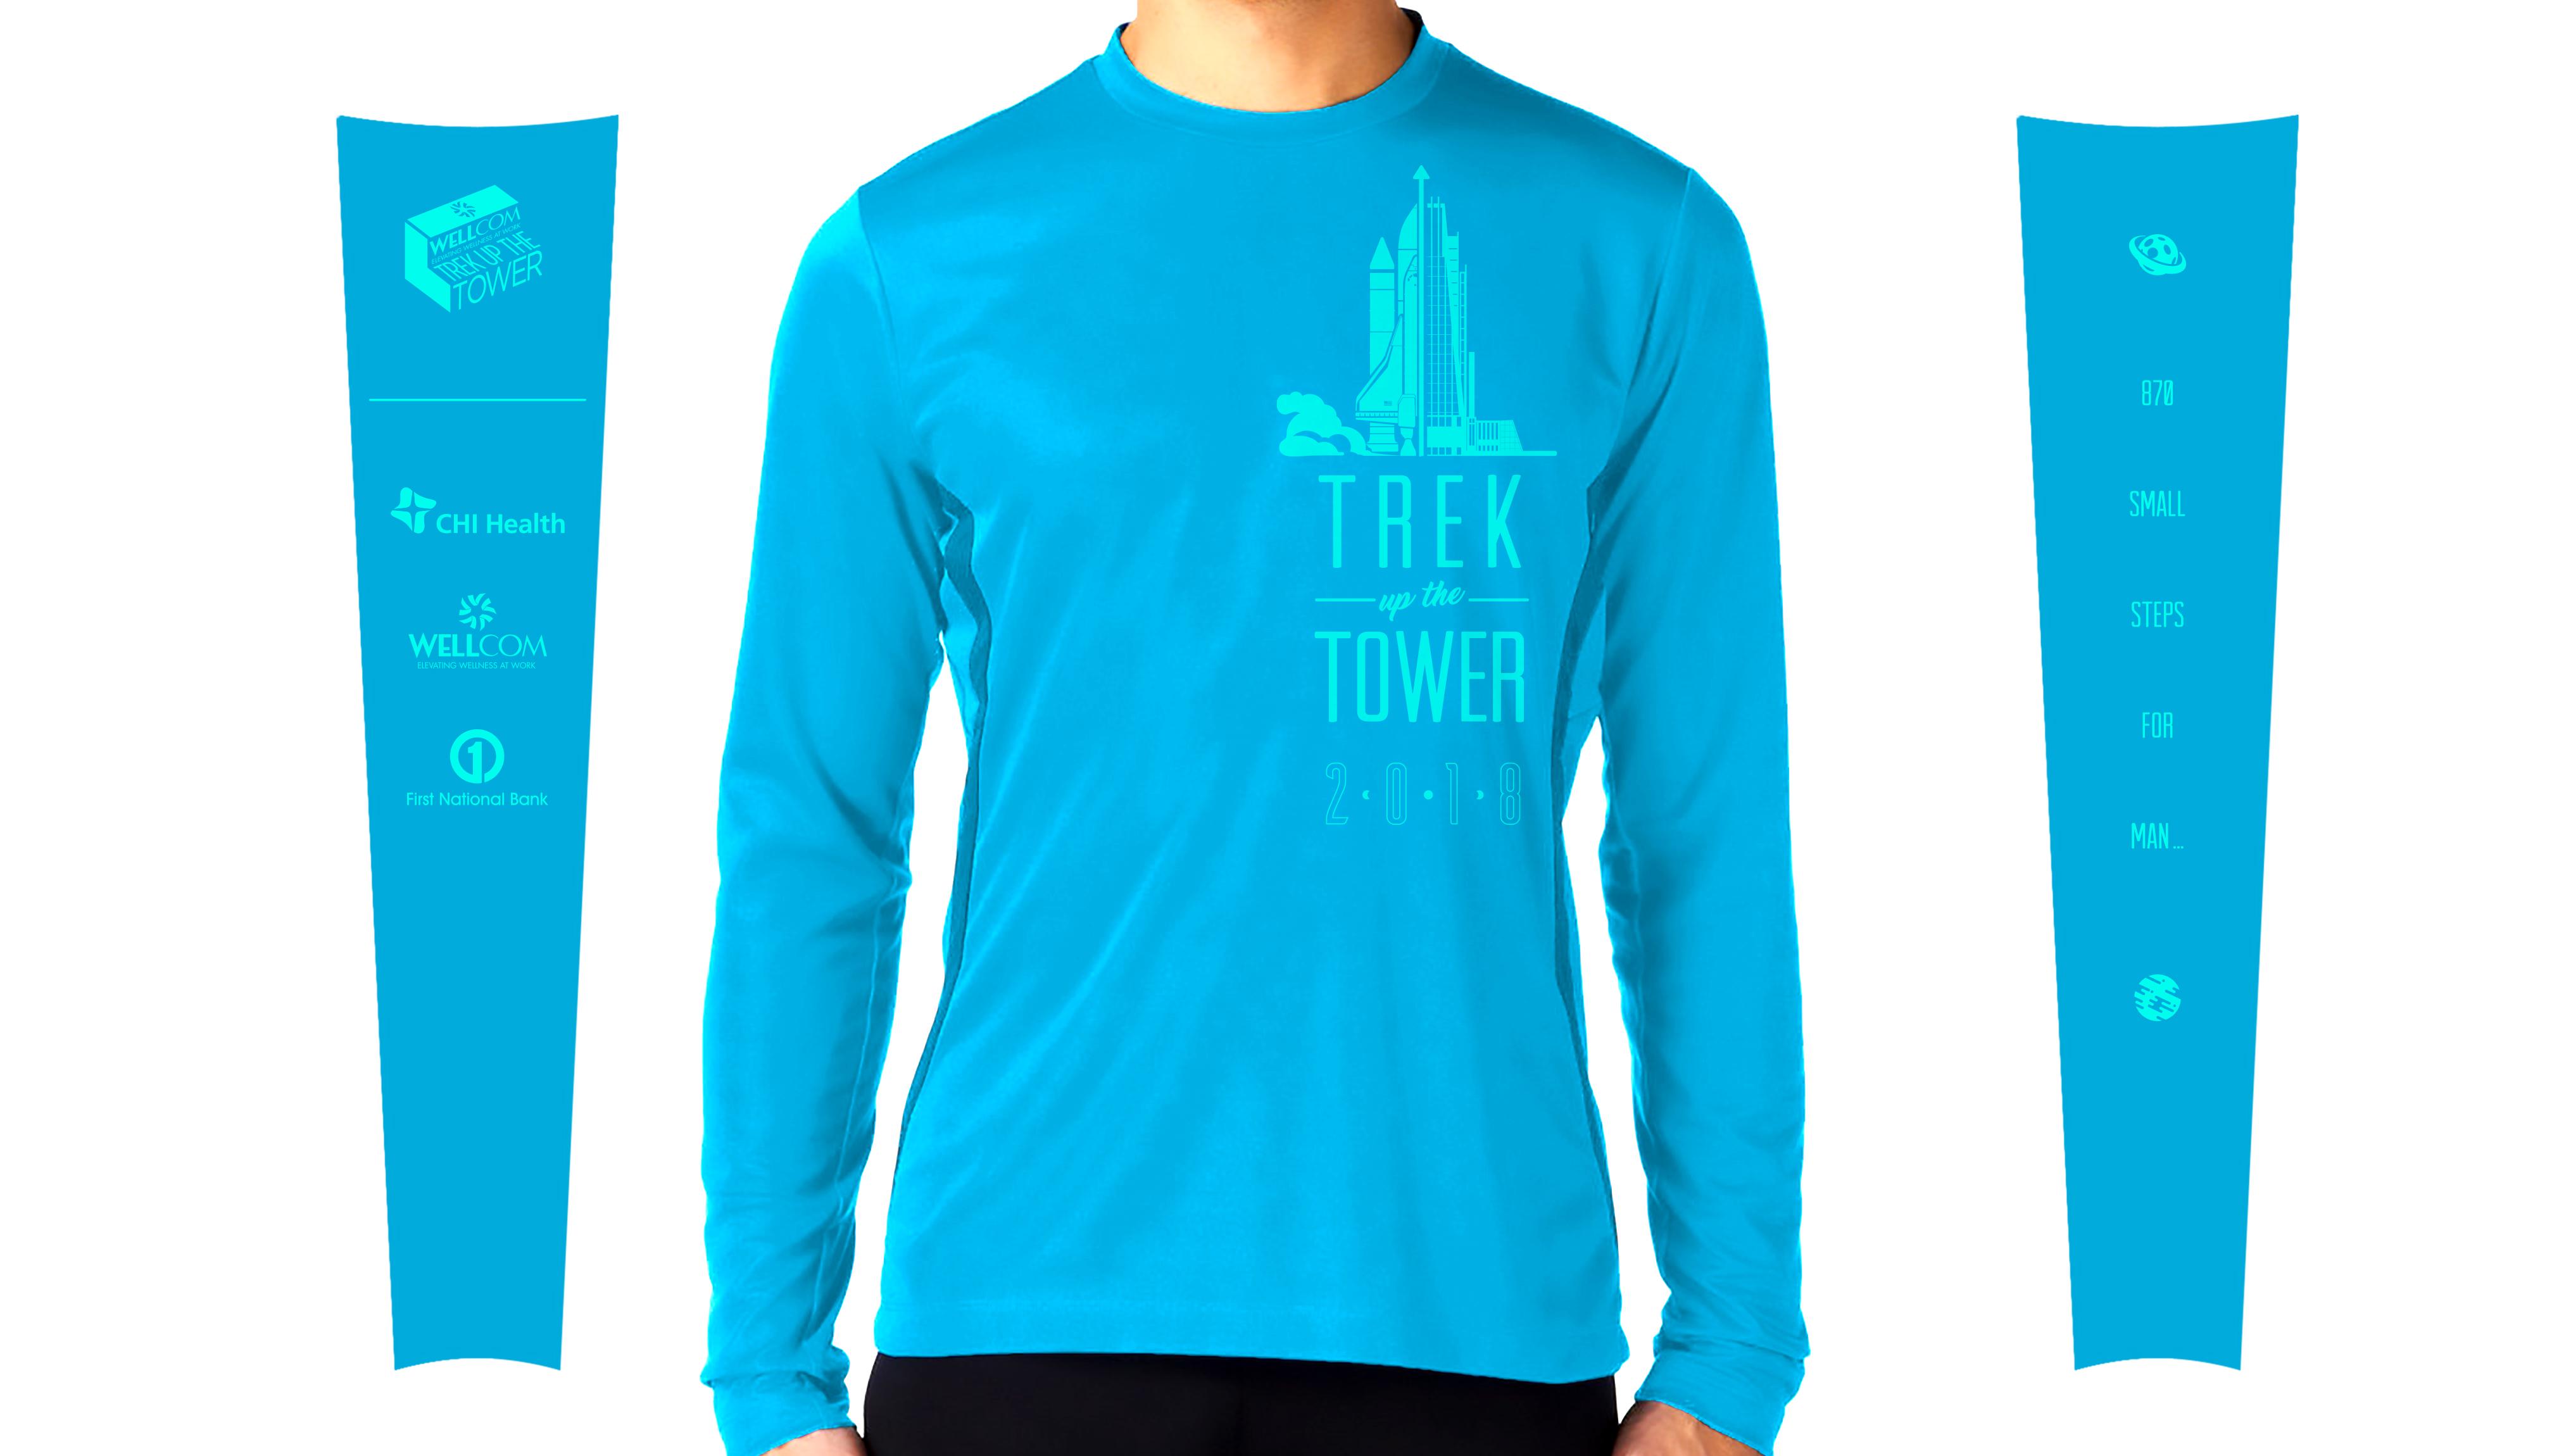 2018 Trek Up the Tower Participant Shirt - Atomic Blue